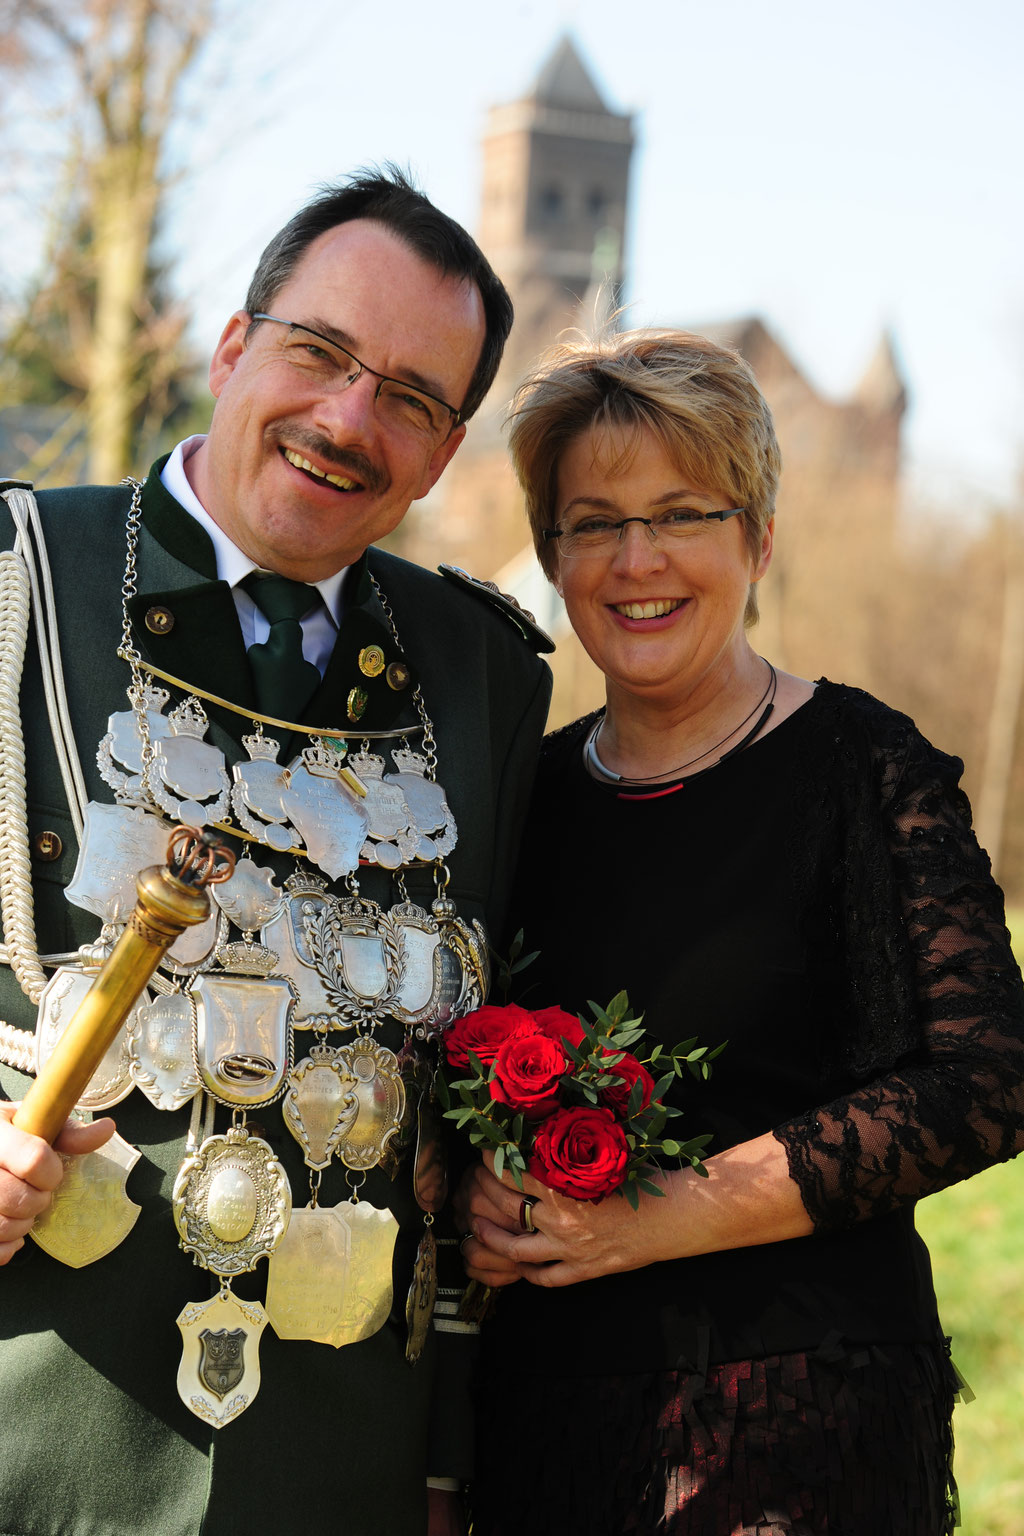 S.M. Michael Rönicke & Königin Christiana 2014/2015